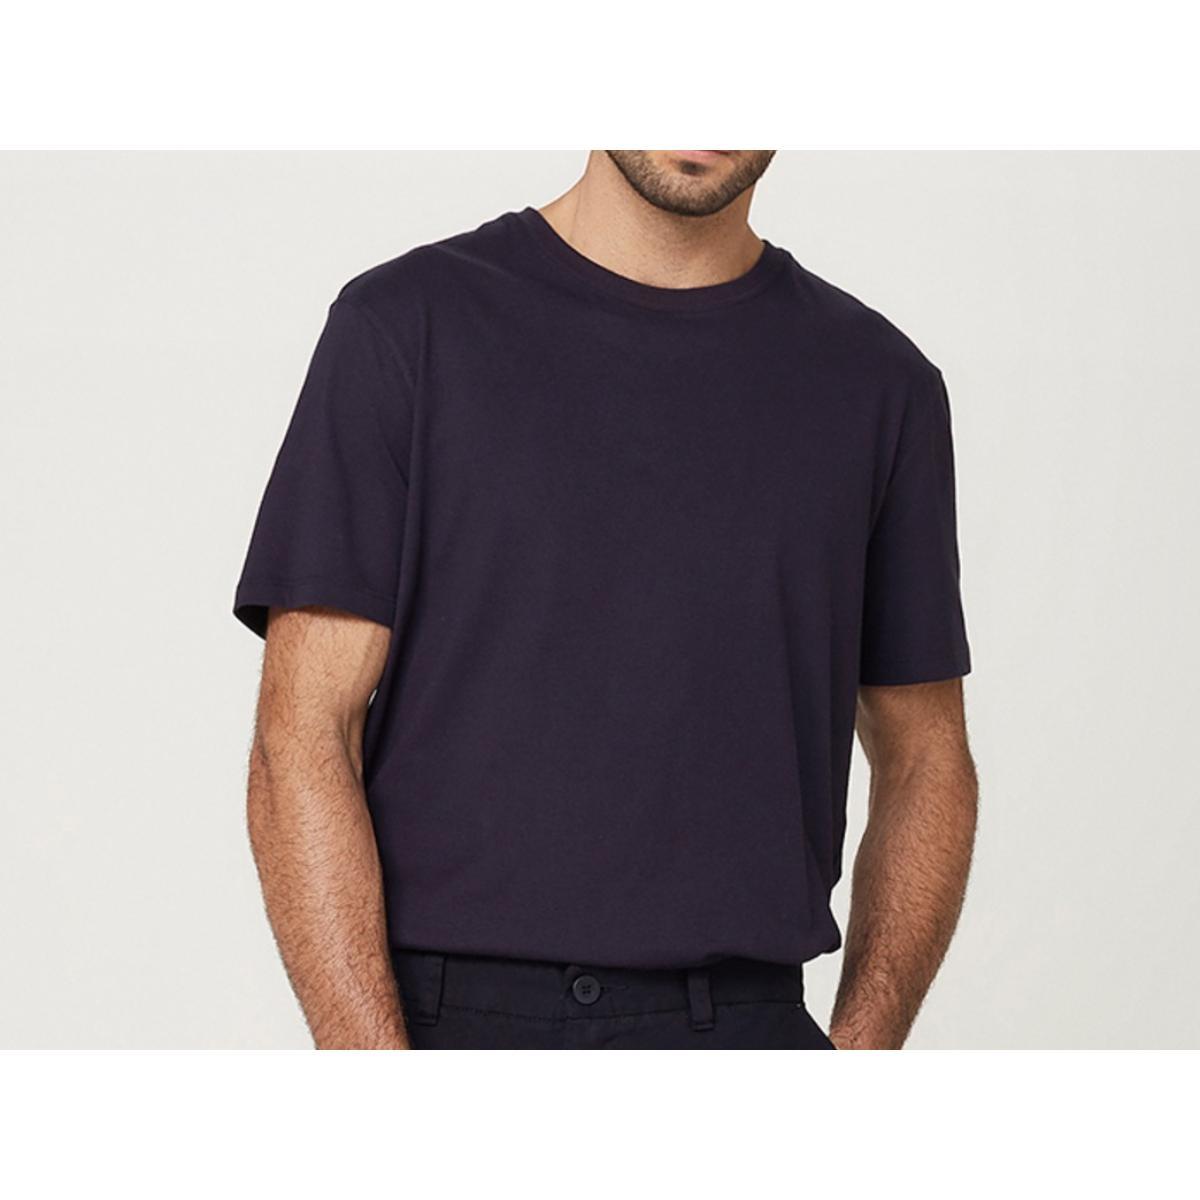 Camiseta Masculina Hering 0227 Ax7en Marinho